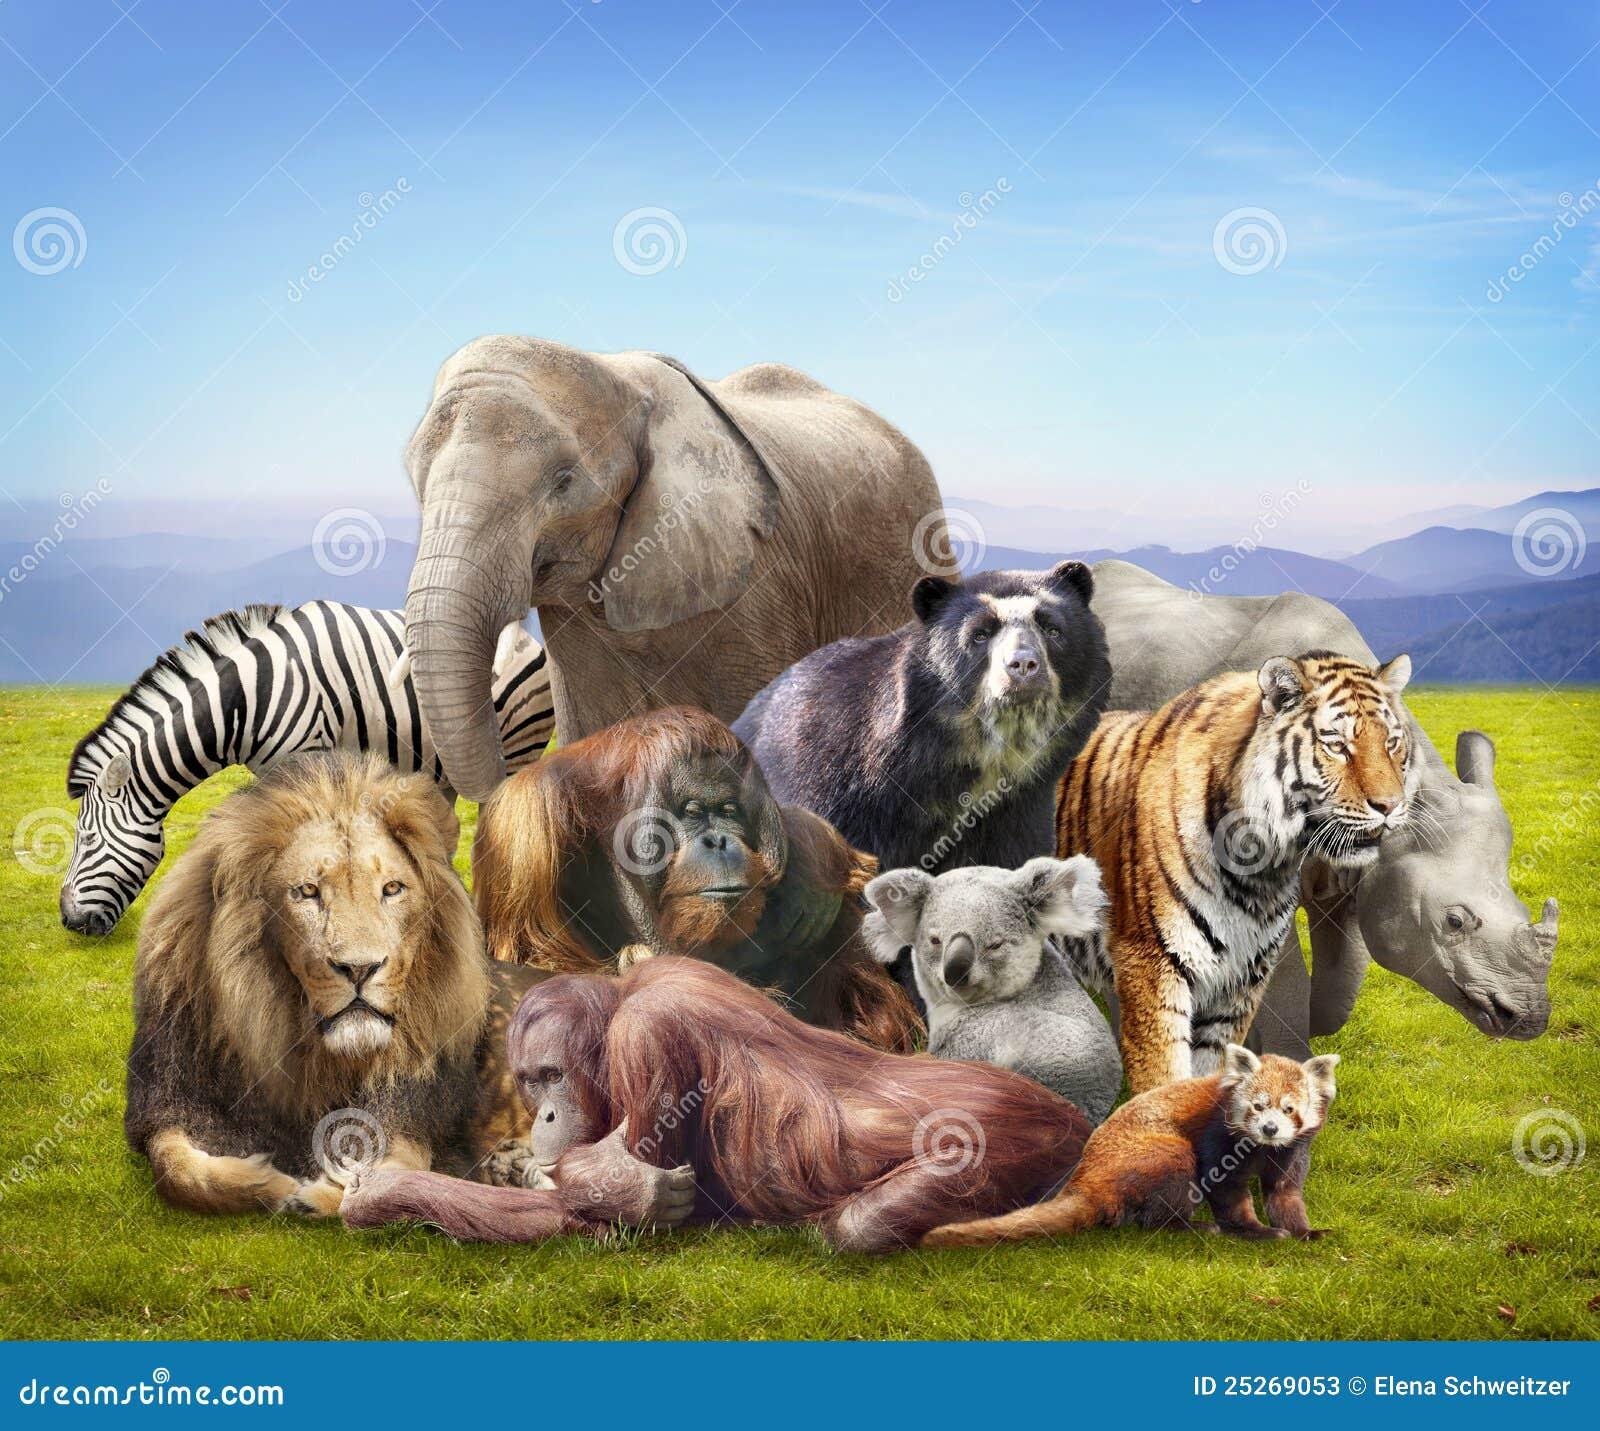 Group of animals stock image Image of mammals panda